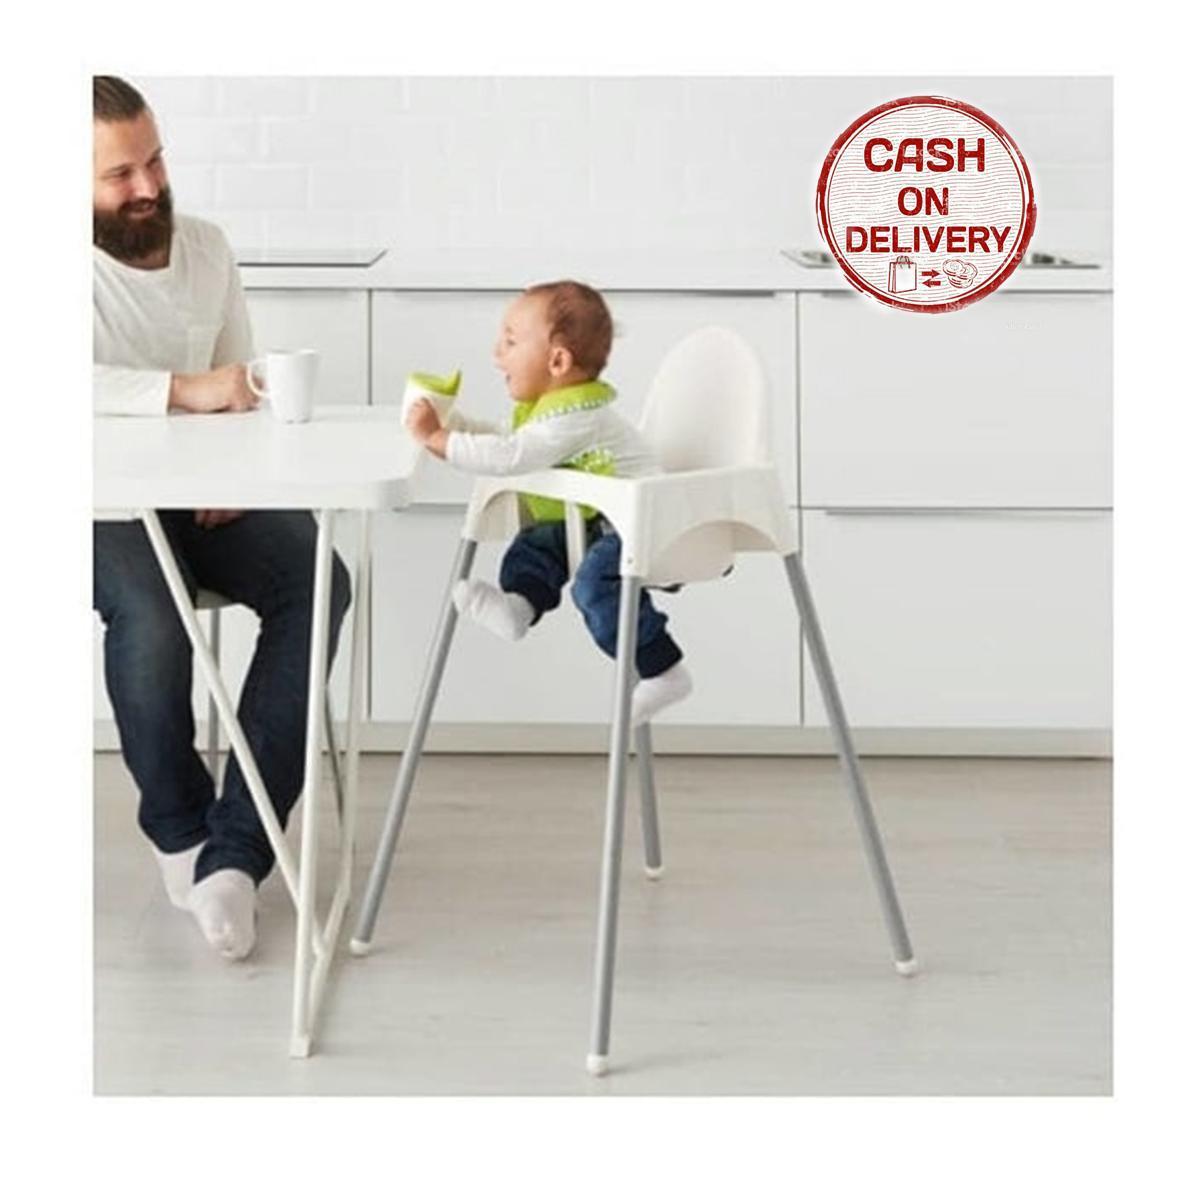 Kado Unik-- Ikea Kursi Makan Anak Dengan Baki / Baby Highchair / Kursi Makan Bayi Ikea Antilop / Tempat Duduk Bayi / Baby Safe Separable High Chair / Kursi Makan Dengan Baki Murah / Kursi Tinggi Bayi